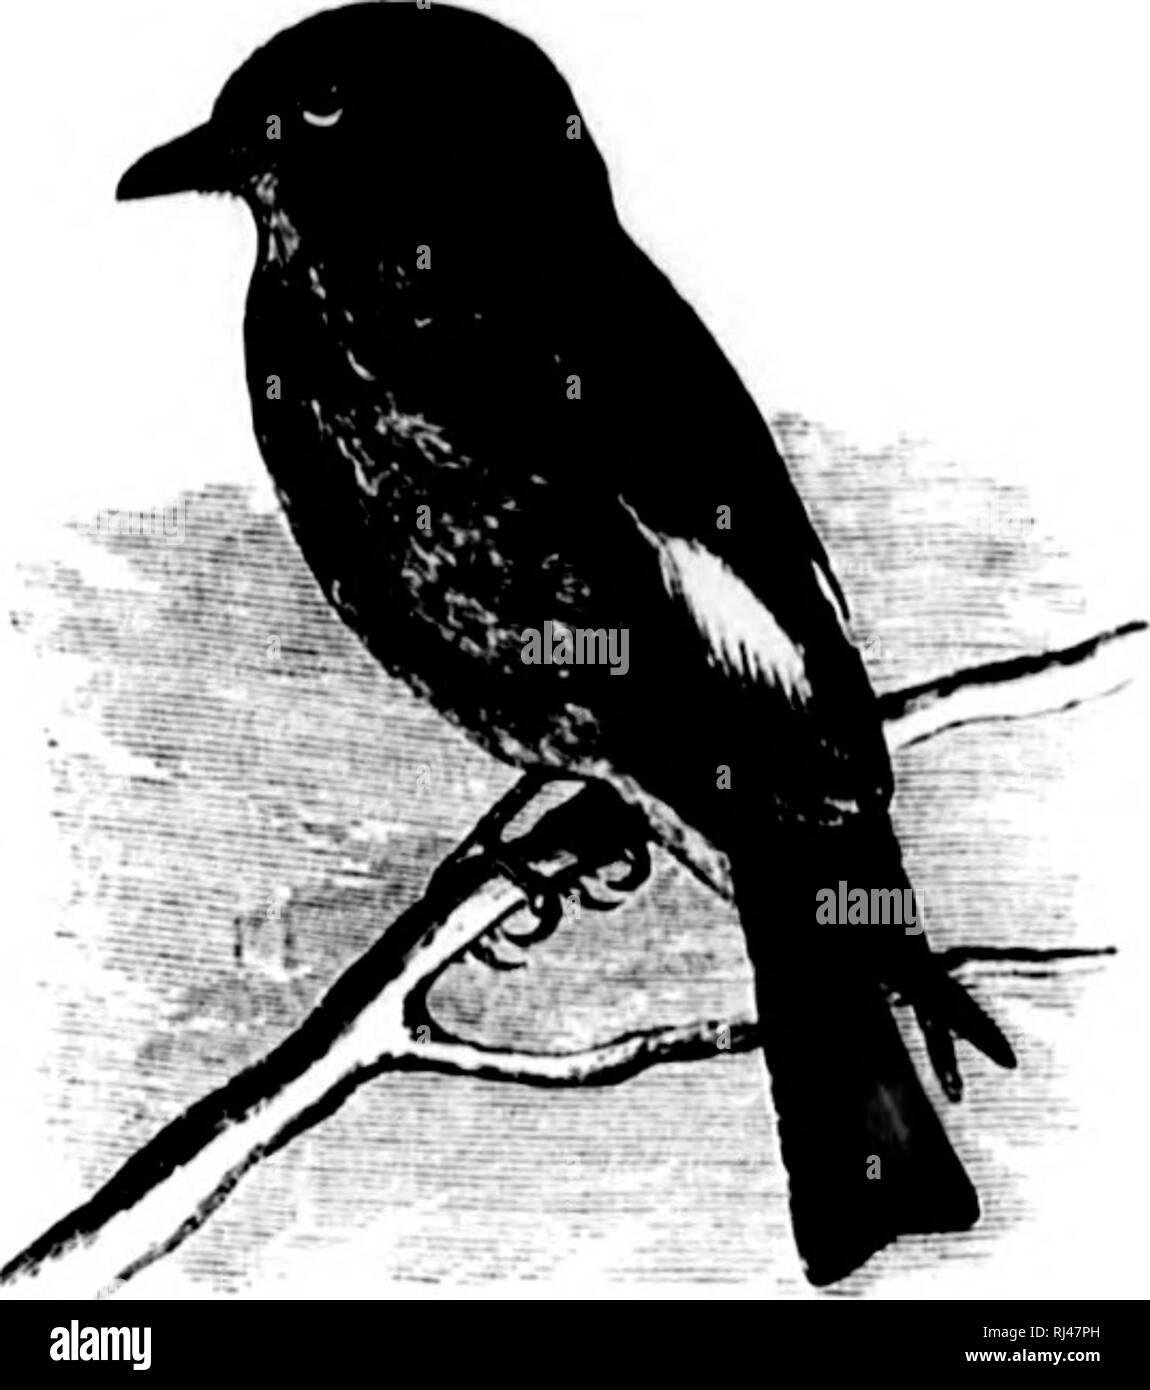 . A history of North American birds [microform] : land birds. Birds; Ornithology; Oiseaux; Ornithologie. TYUAXNIIJ.E — TlIK FLYCATCIIEUS. 35;j Contopus borealis, Haikd. OLIVE-BIOED FLYCATCHER. Turniniiis bumtlis, Sw. k Uioil. F. Itor.-Aui. II, 1H31, 141, pliitc. Mi/iuliius Ijuiriilis, OitAV, (Jcni'iu, 1, '2ii. Musficu/ia cuopcri, NriTALL, Man. 1, 18yj, ^S'J. — Arn. Oiii. Hiog. 11, 1834, Vl-i ; V, ISUi), 422, I'l. clxxiv. — In. Syiioiisis, 18;J!I, 41. In. Birds Am. I, 1840, 212, i. Iviii. I'l/mnnun coiijicri, linN.vi'. List, 1838. — NliiAl.i,, Man. I, (2(1. I'll.,) 184(1, 2!I8. (,'oiiliijiiis - Stock Image